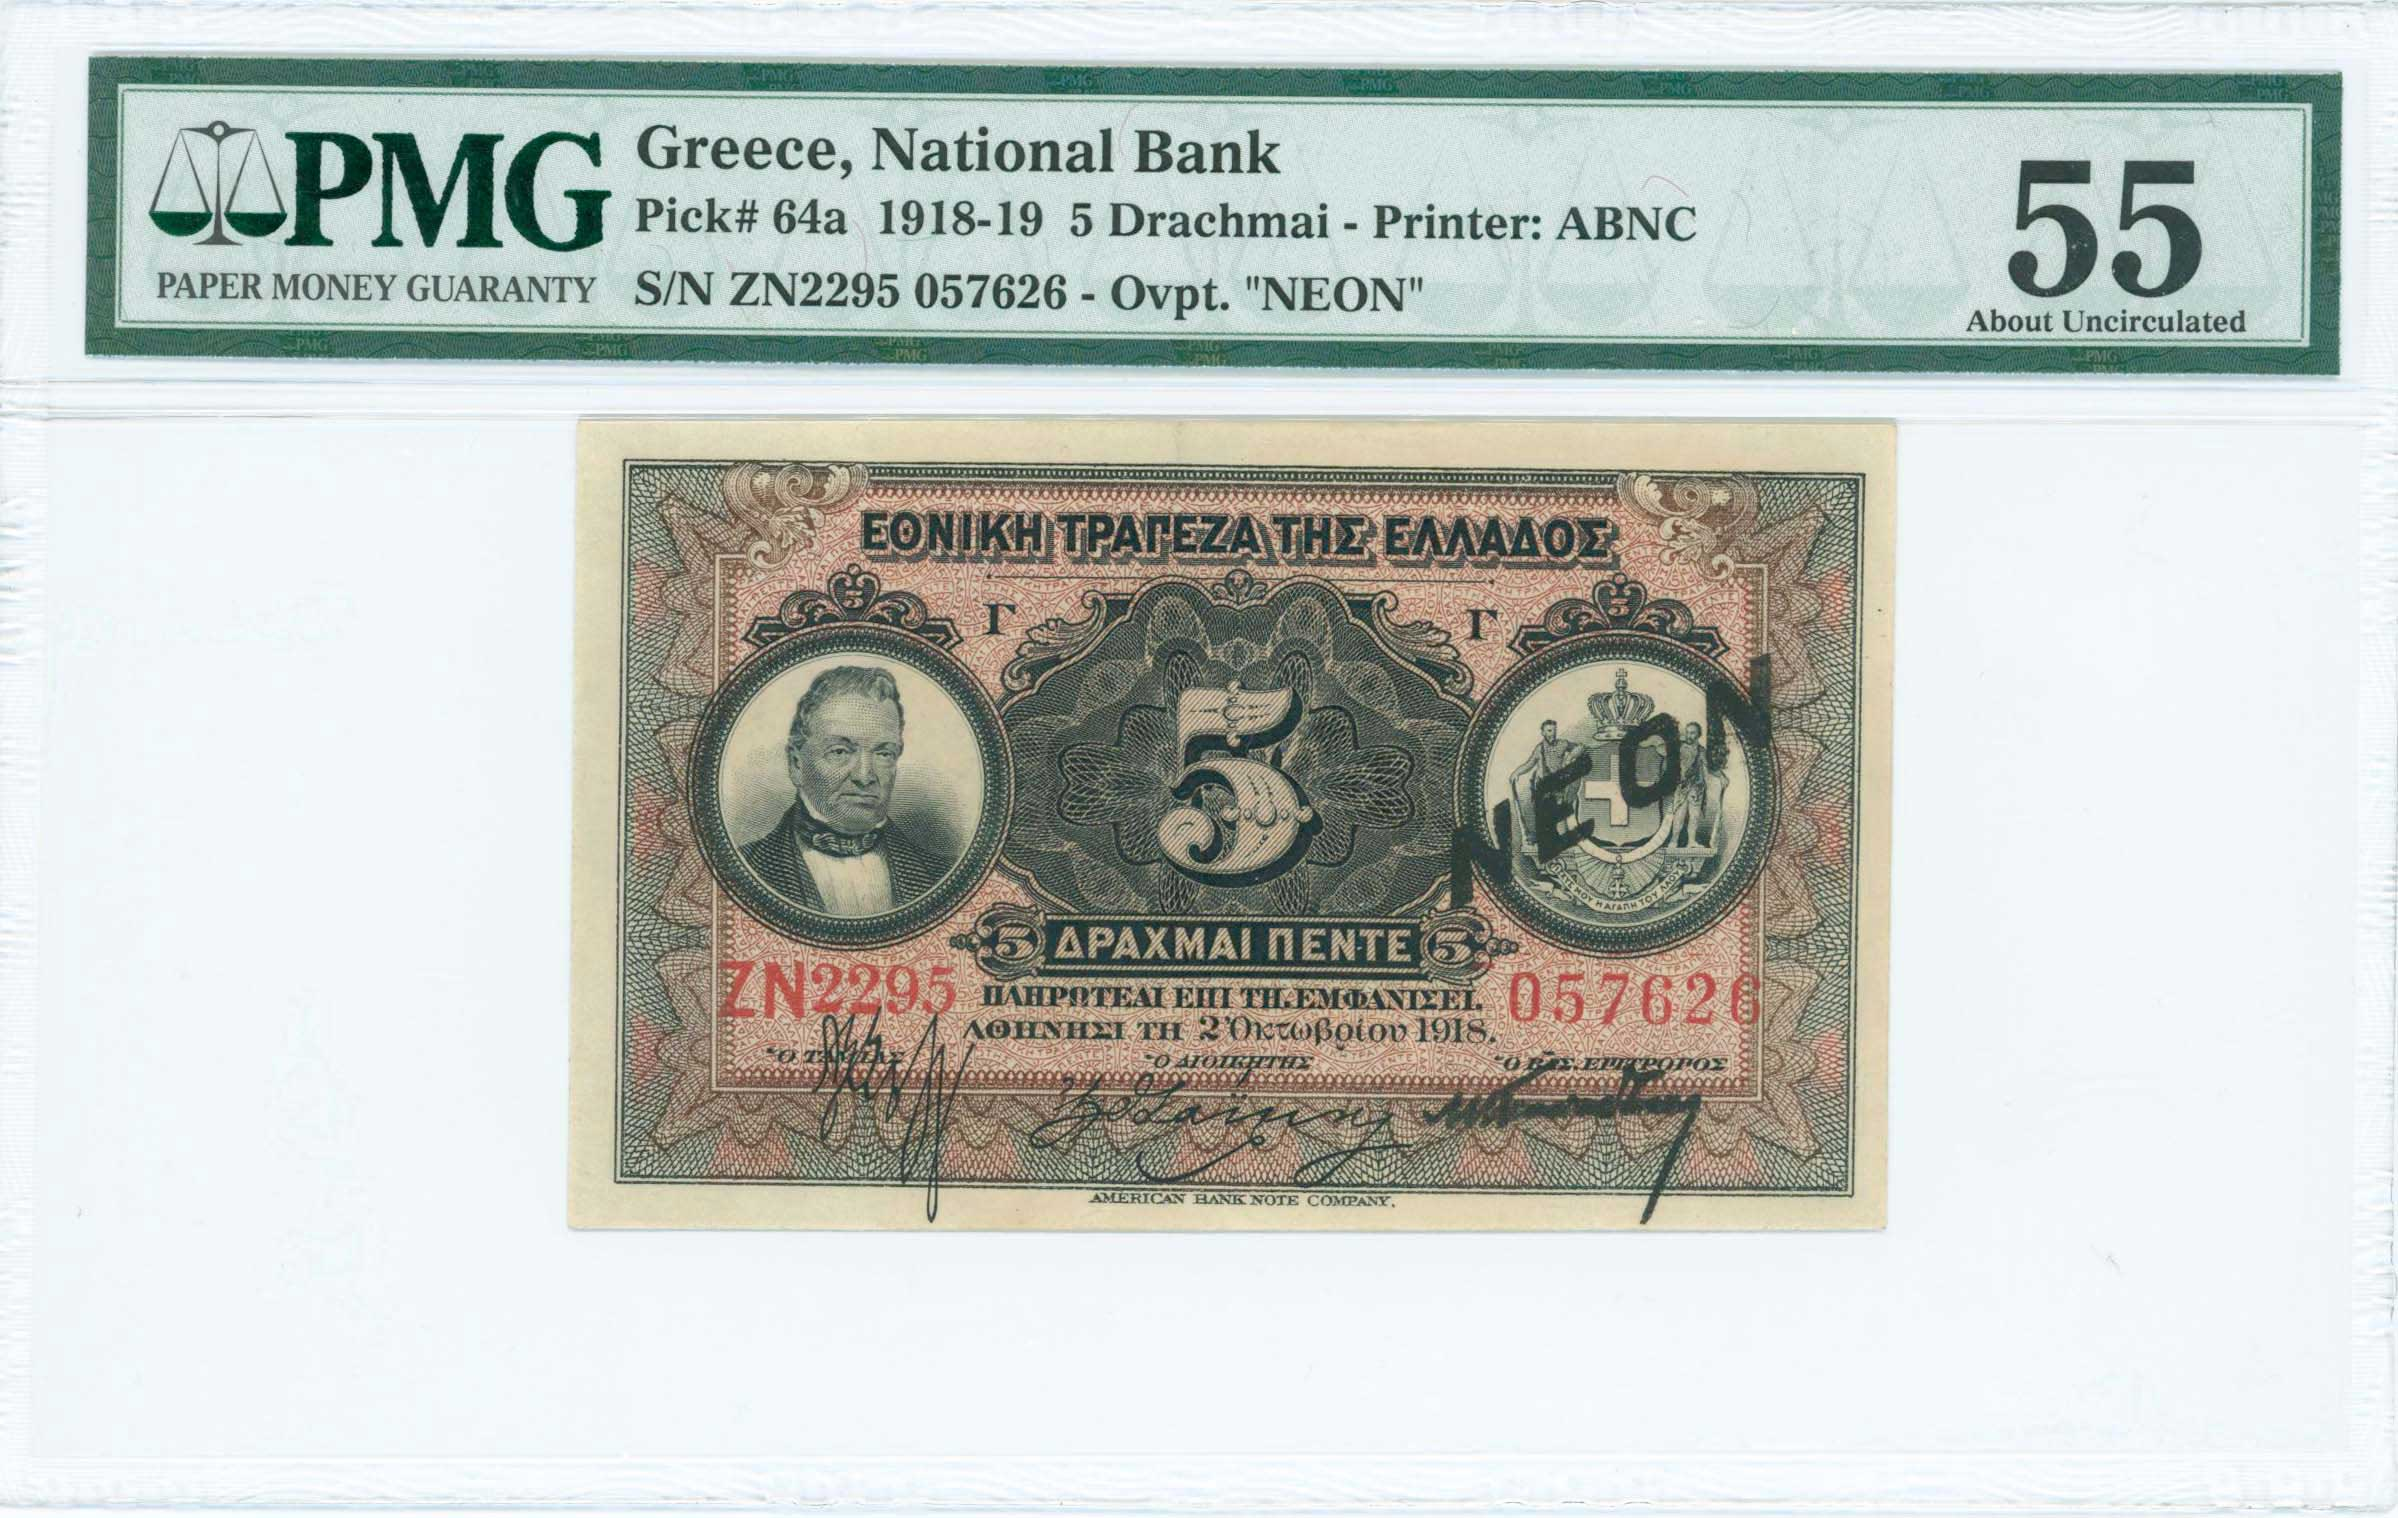 Lot 6403 - -  PAPER MONEY - BANKNOTES National Bank of Greece -  A. Karamitsos Public & Live Internet Auction 671 (Part A)